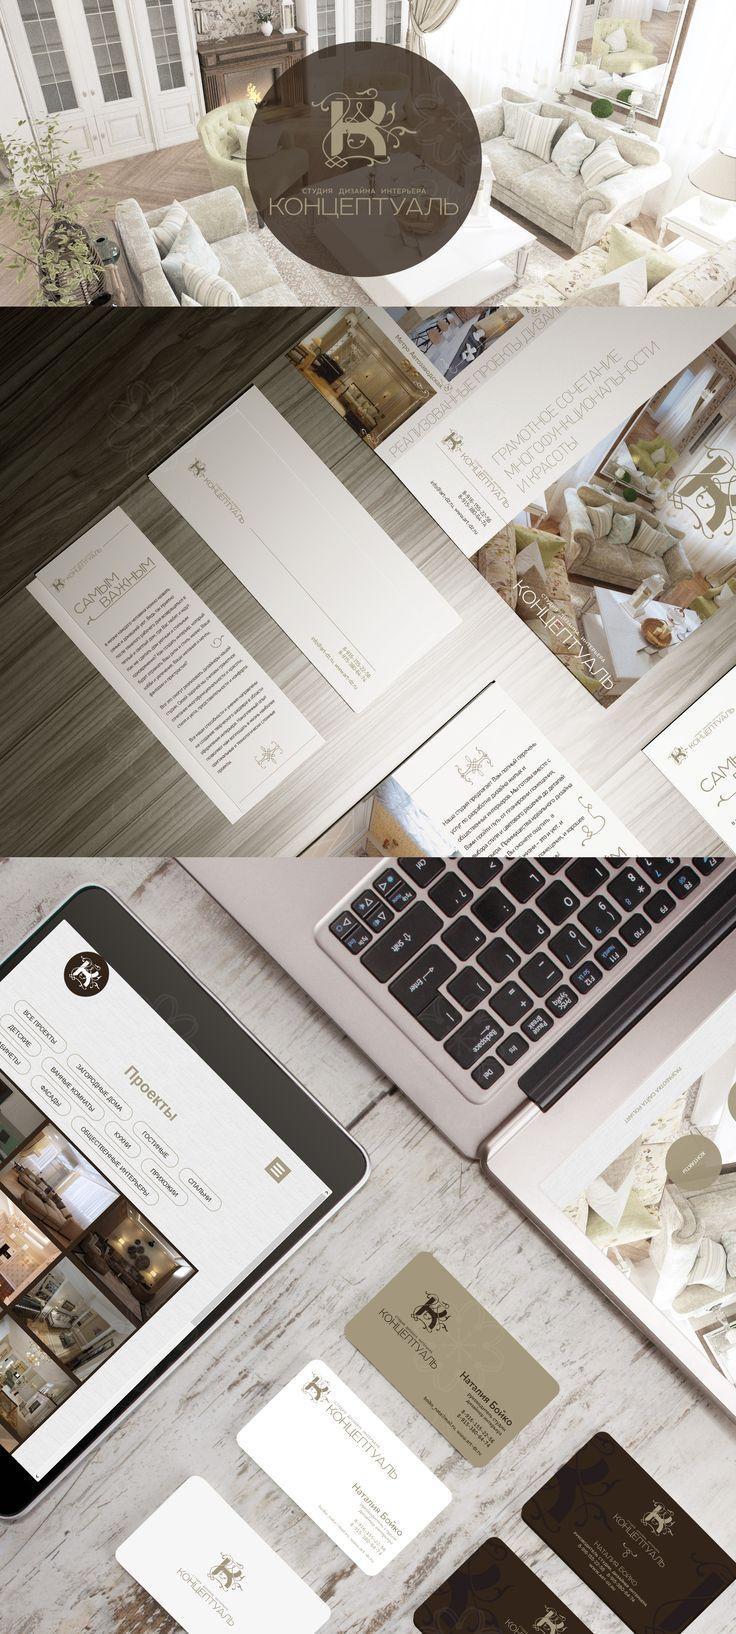 http://art-dz.ru/ Концептуаль Разработка логотипа, айдентики, сайт под ключ